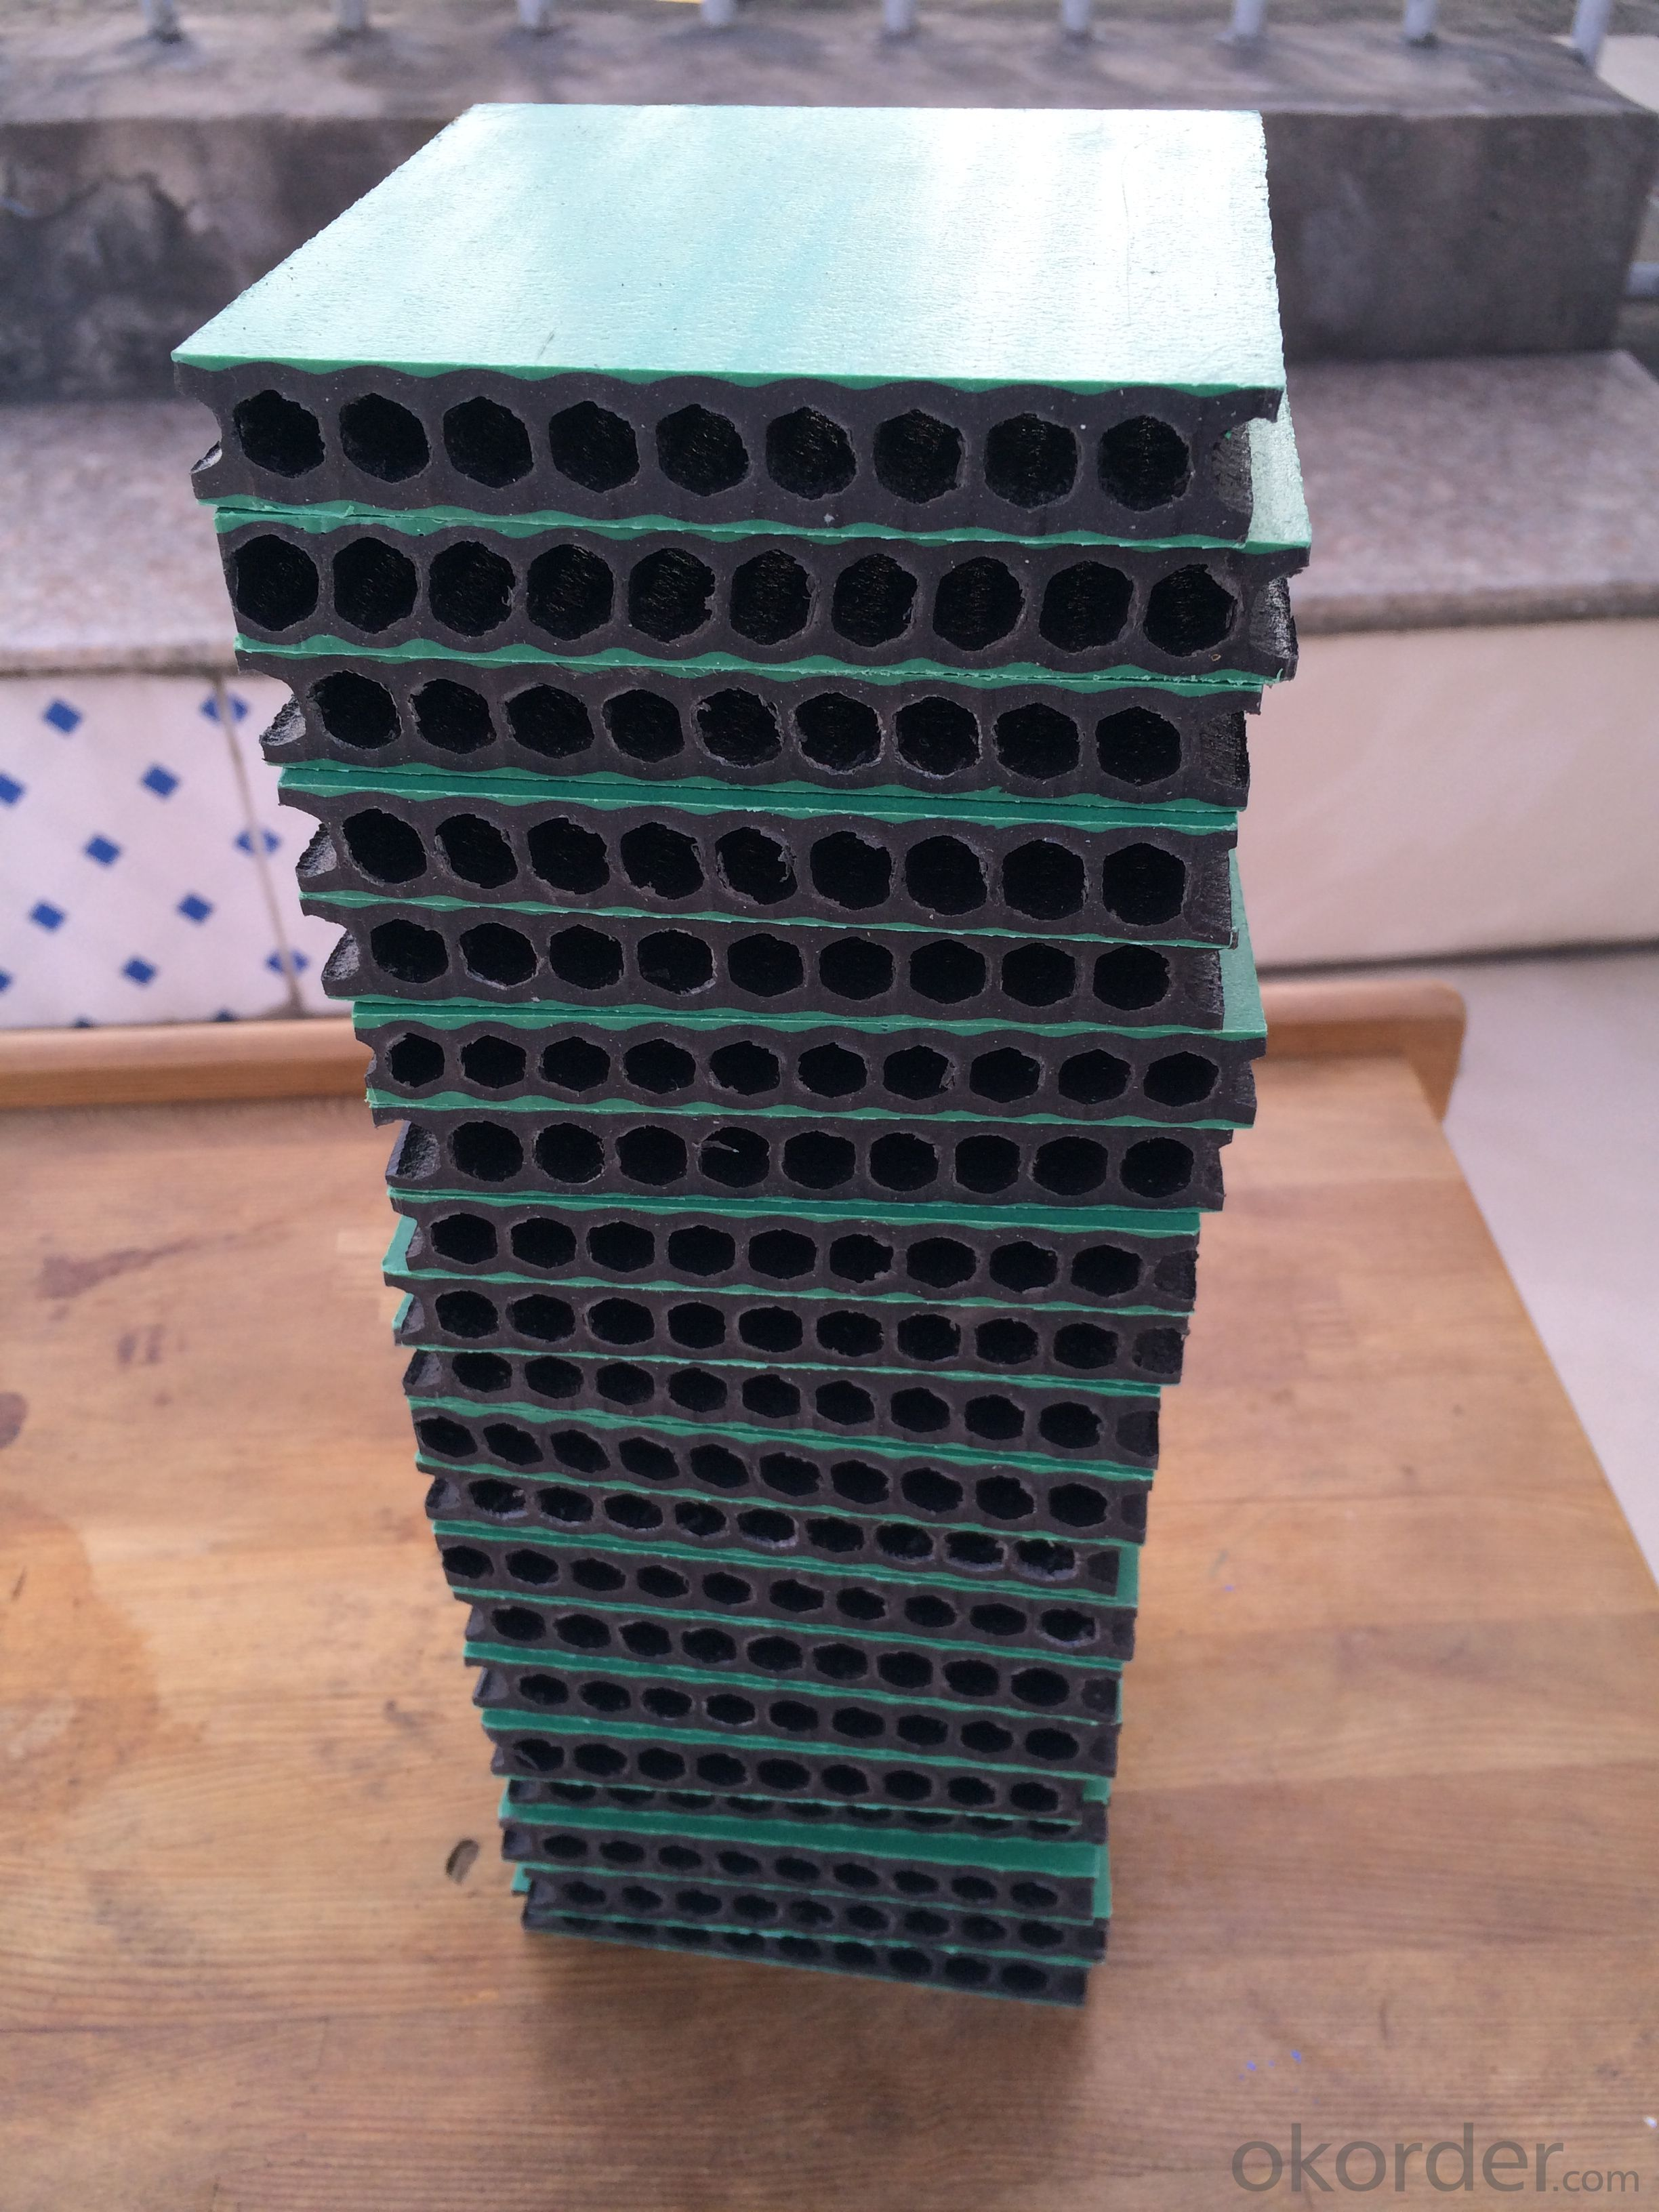 hollow plastic construction formwork